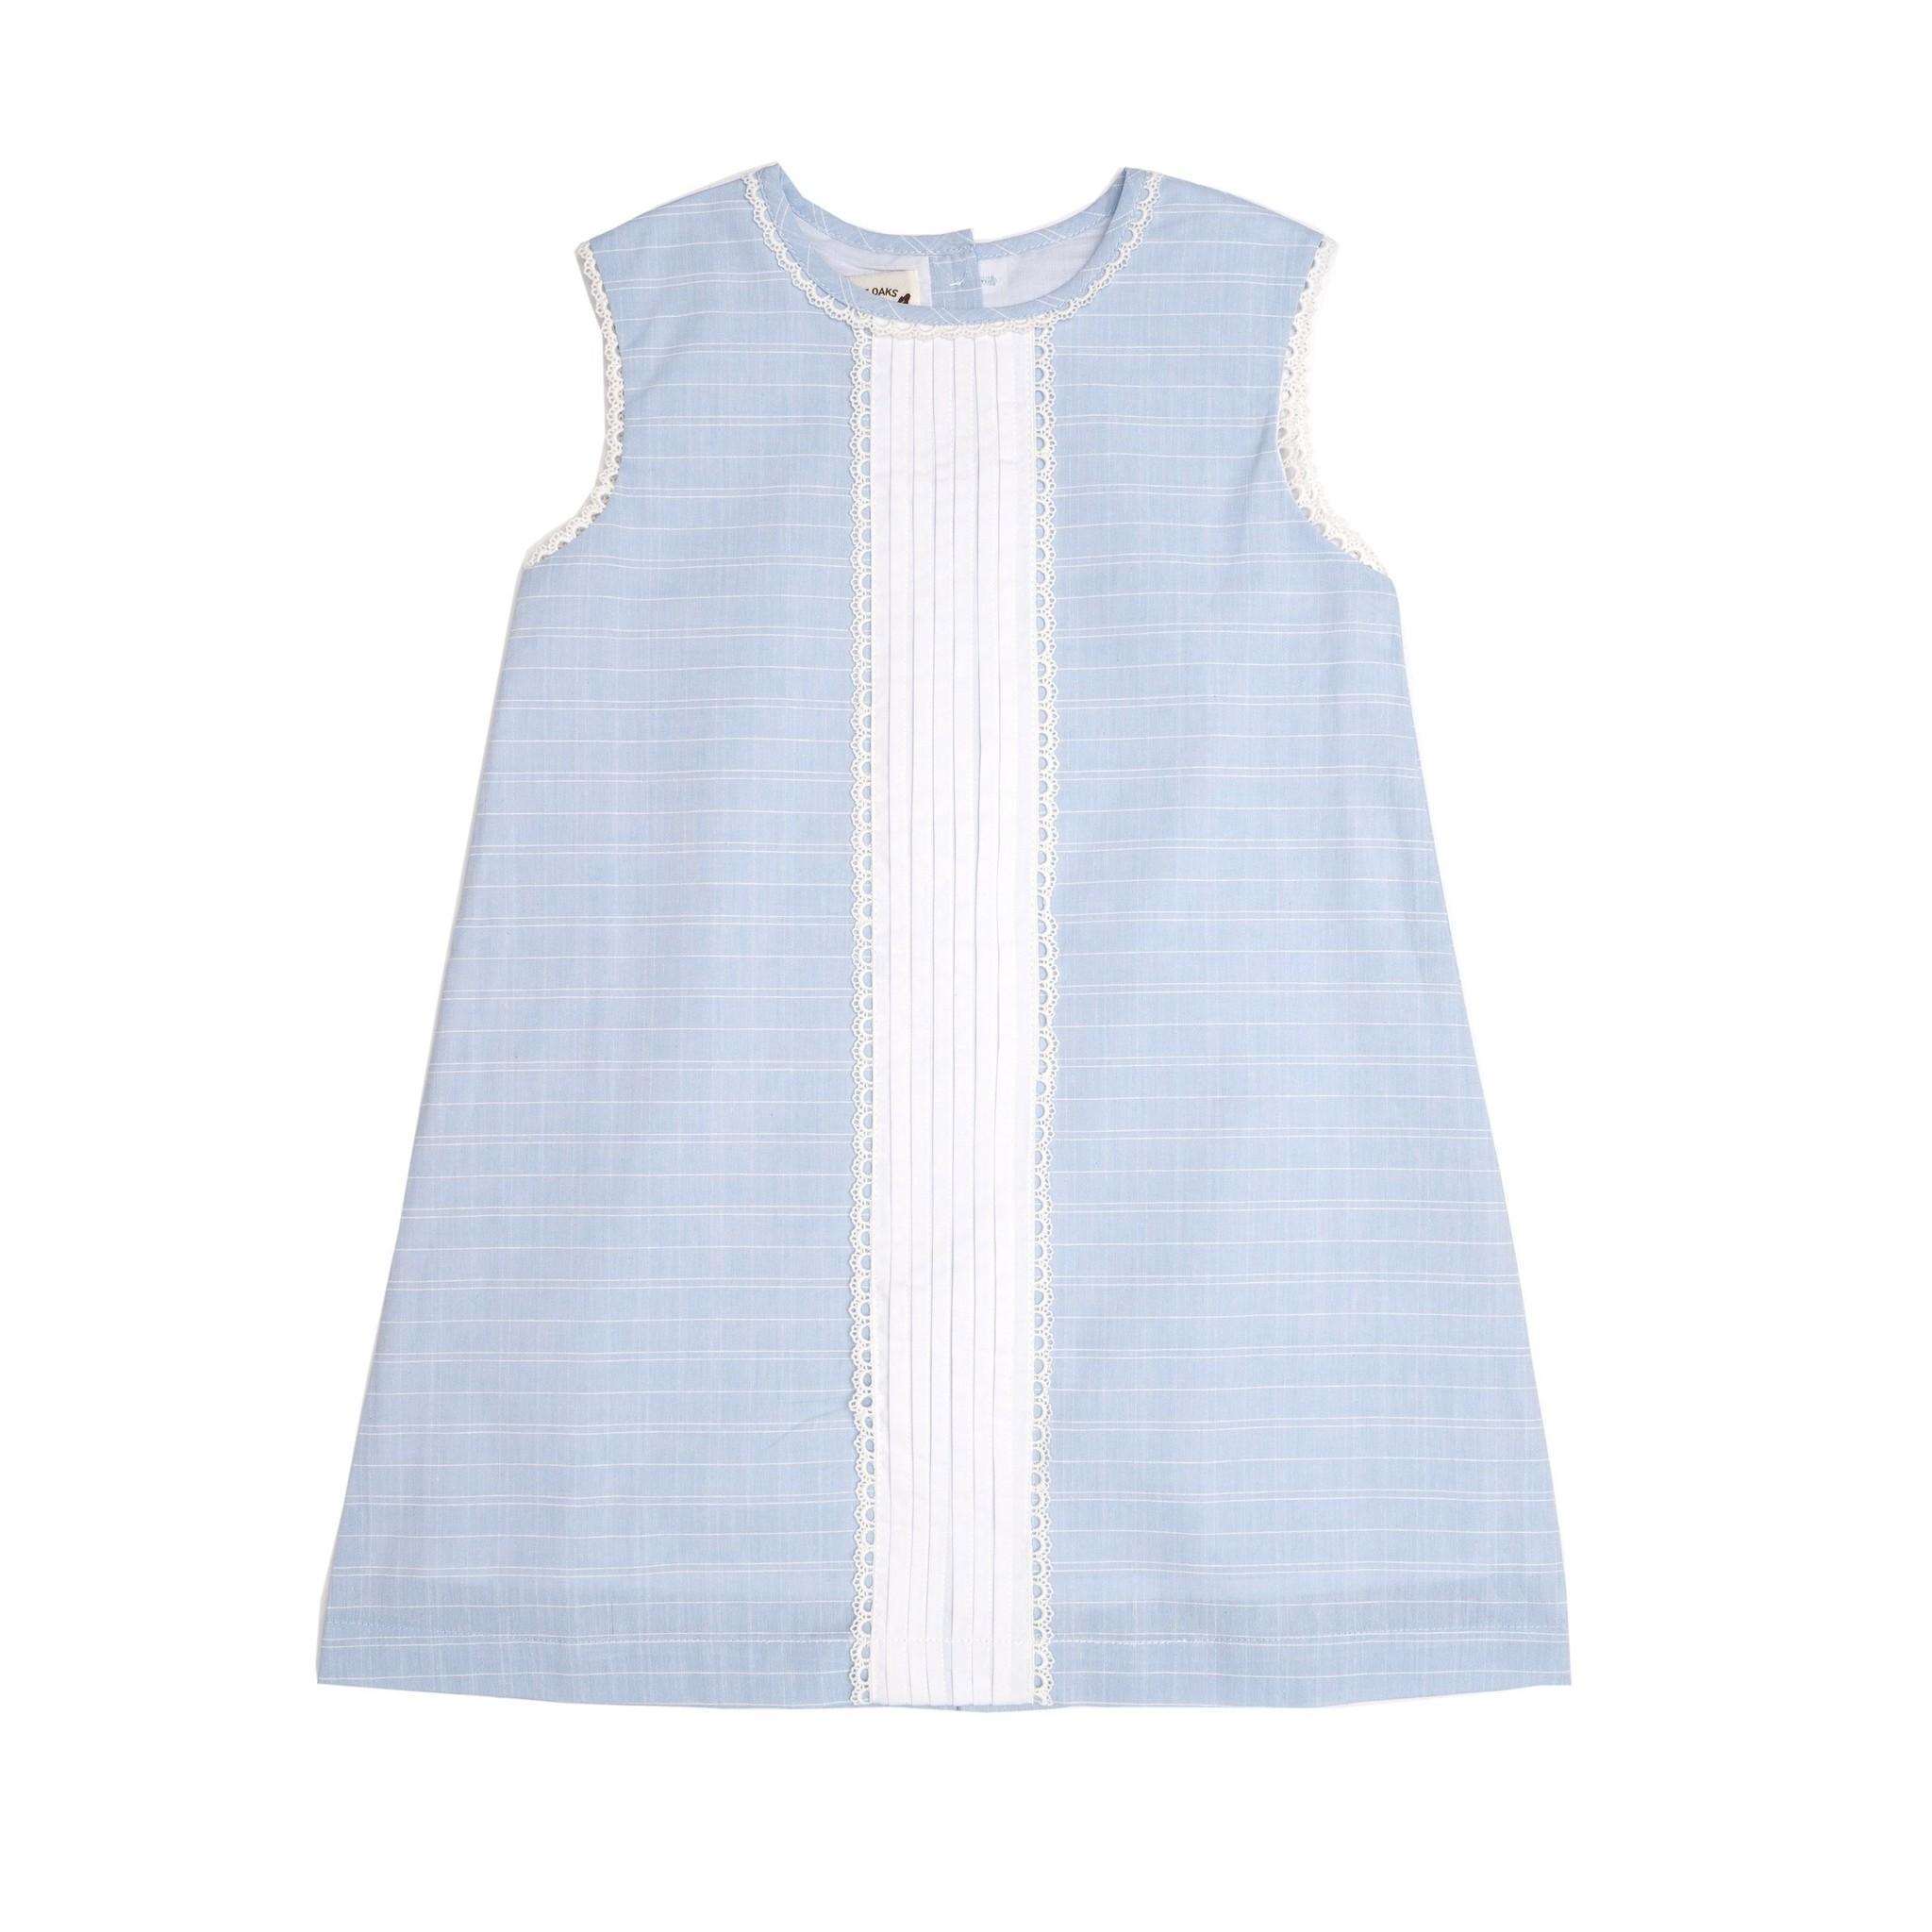 The Oaks Apparel Trinity Blue Dress